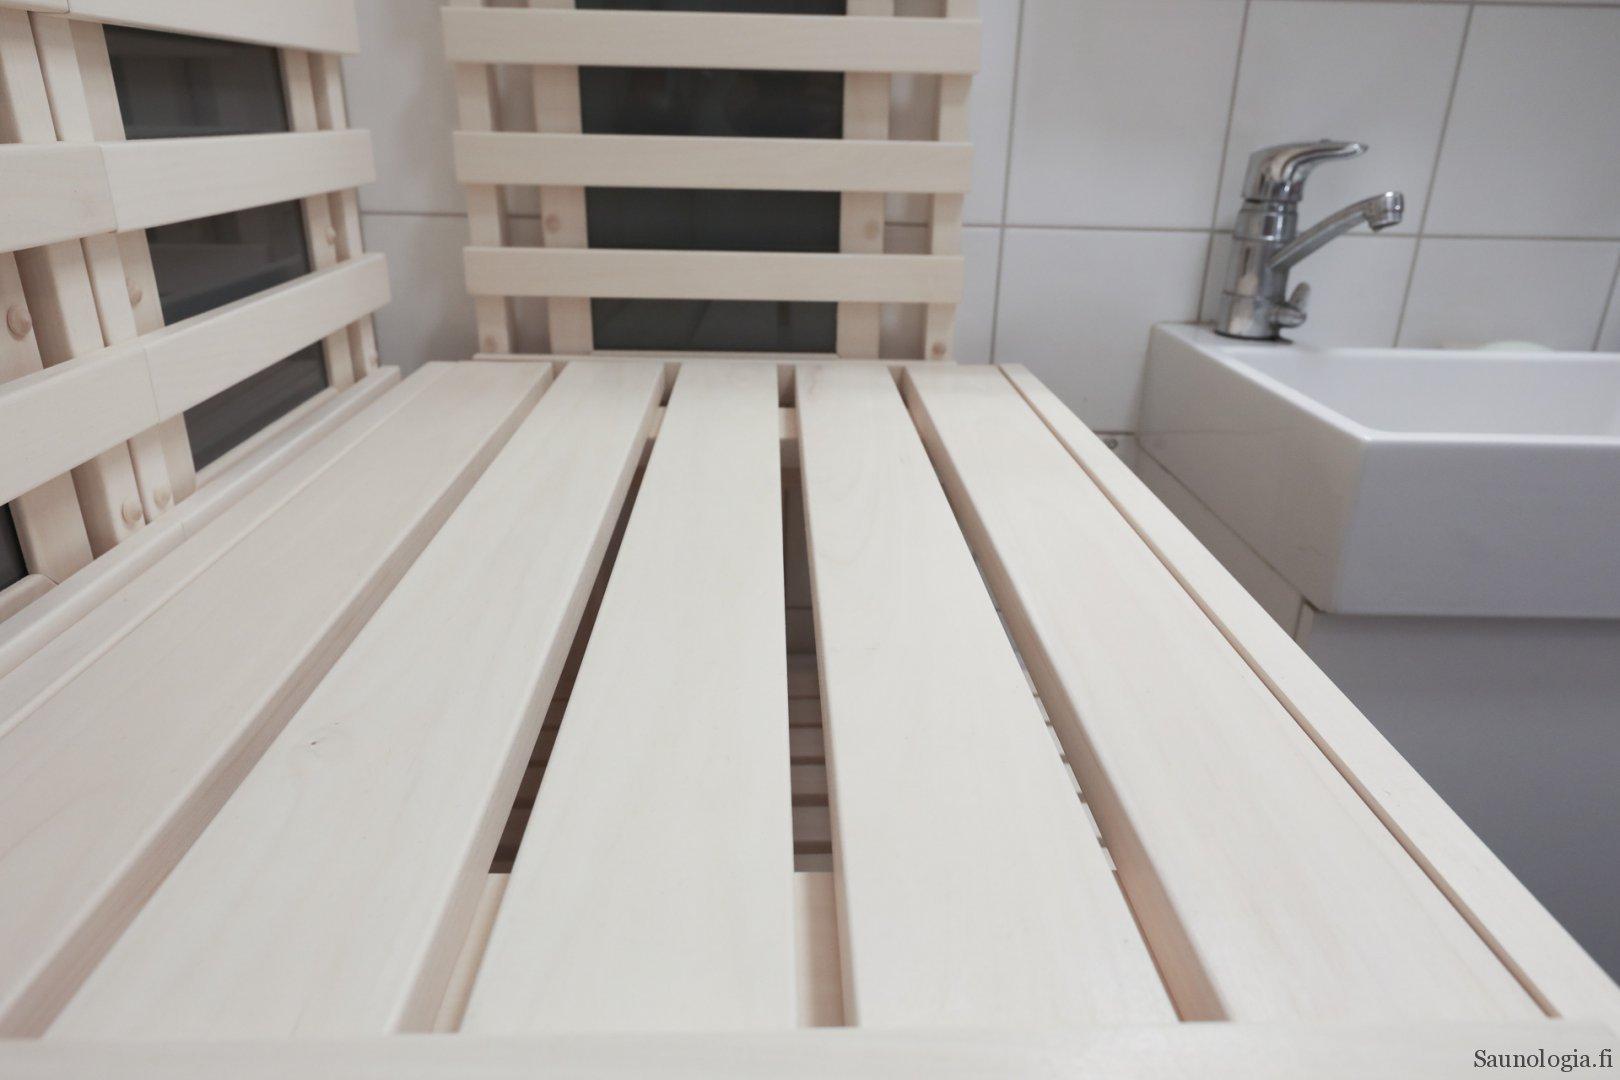 201104-diy-ir-sauna-yleiskuva-laude-detail-0117